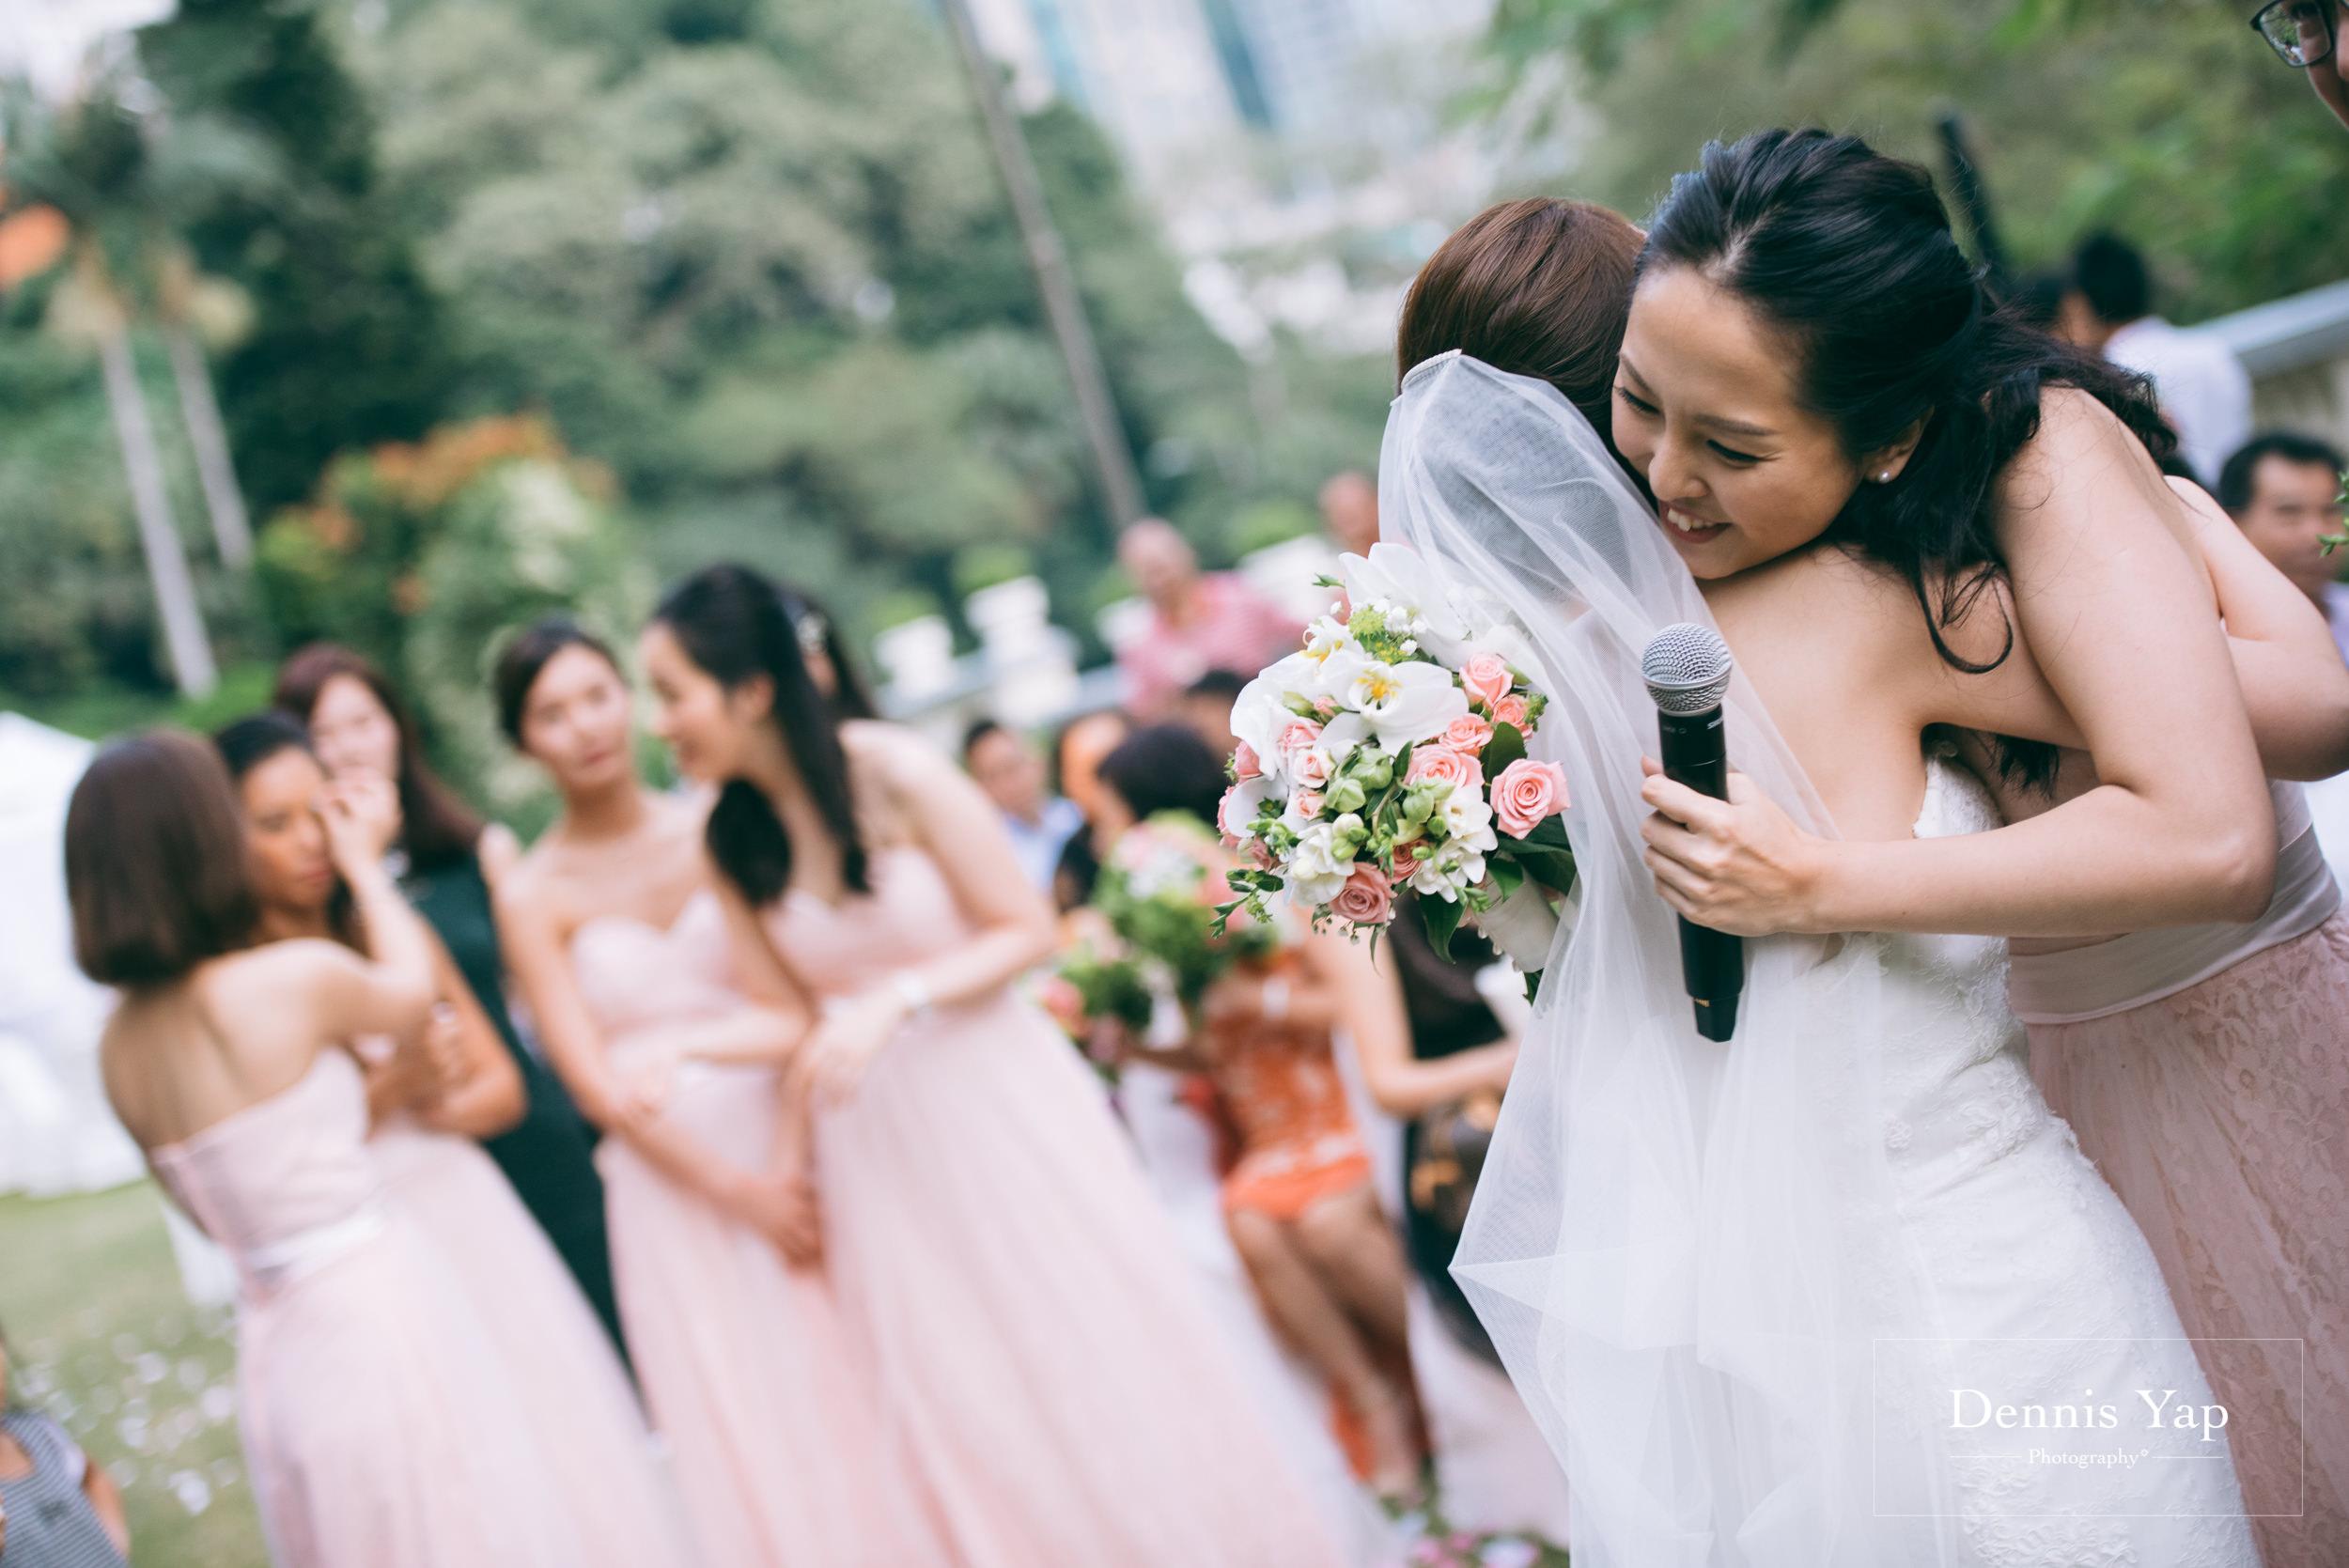 jason crystal wedding day gate crash hong kong garden wedding dennis yap photography-35.jpg